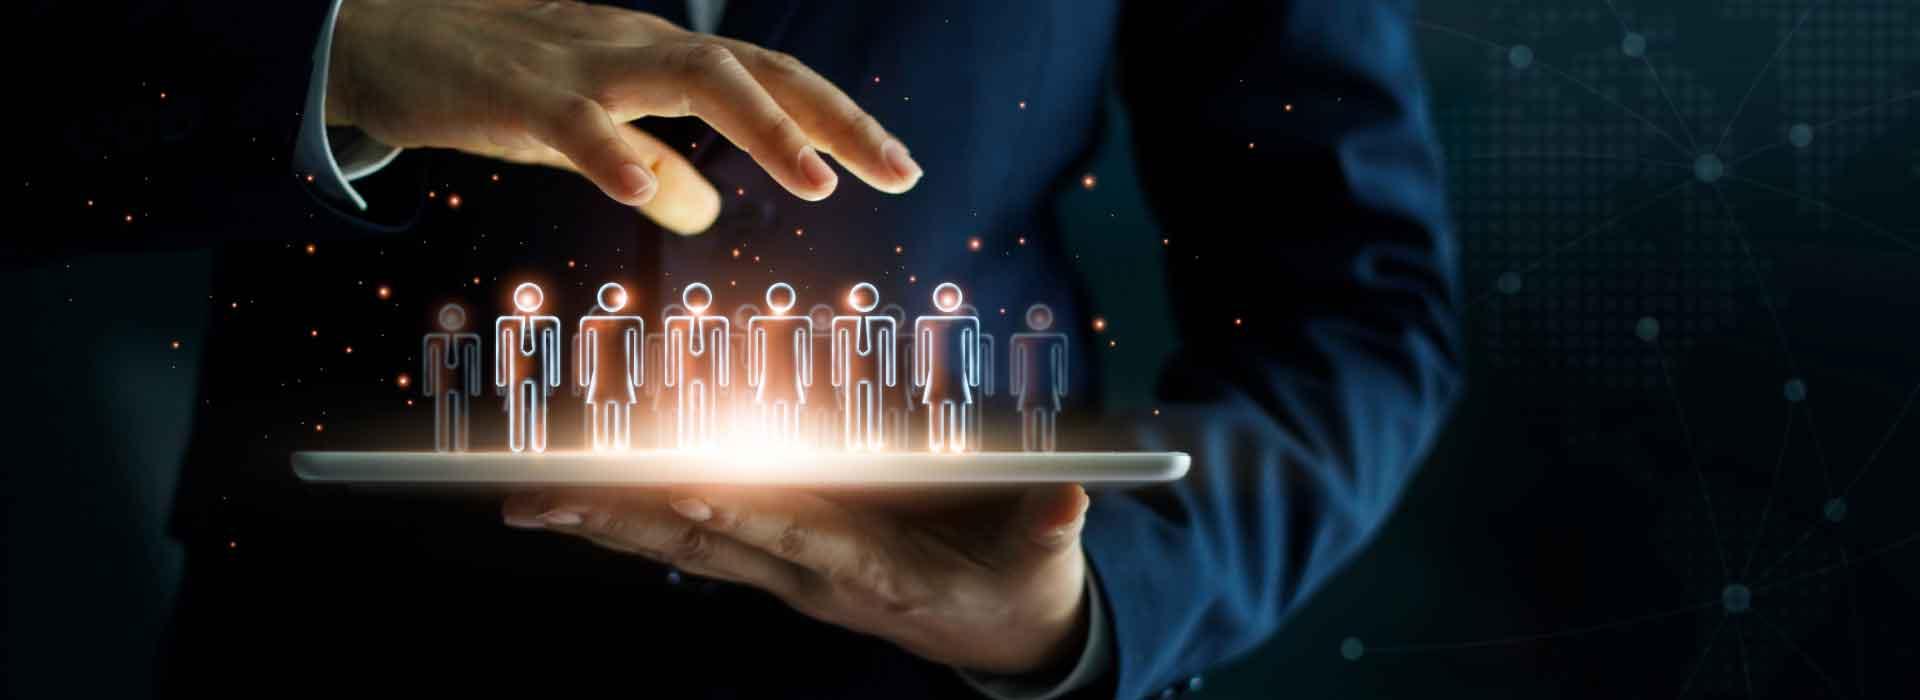 Agrupaciones de empresas innovadoras. FI Group